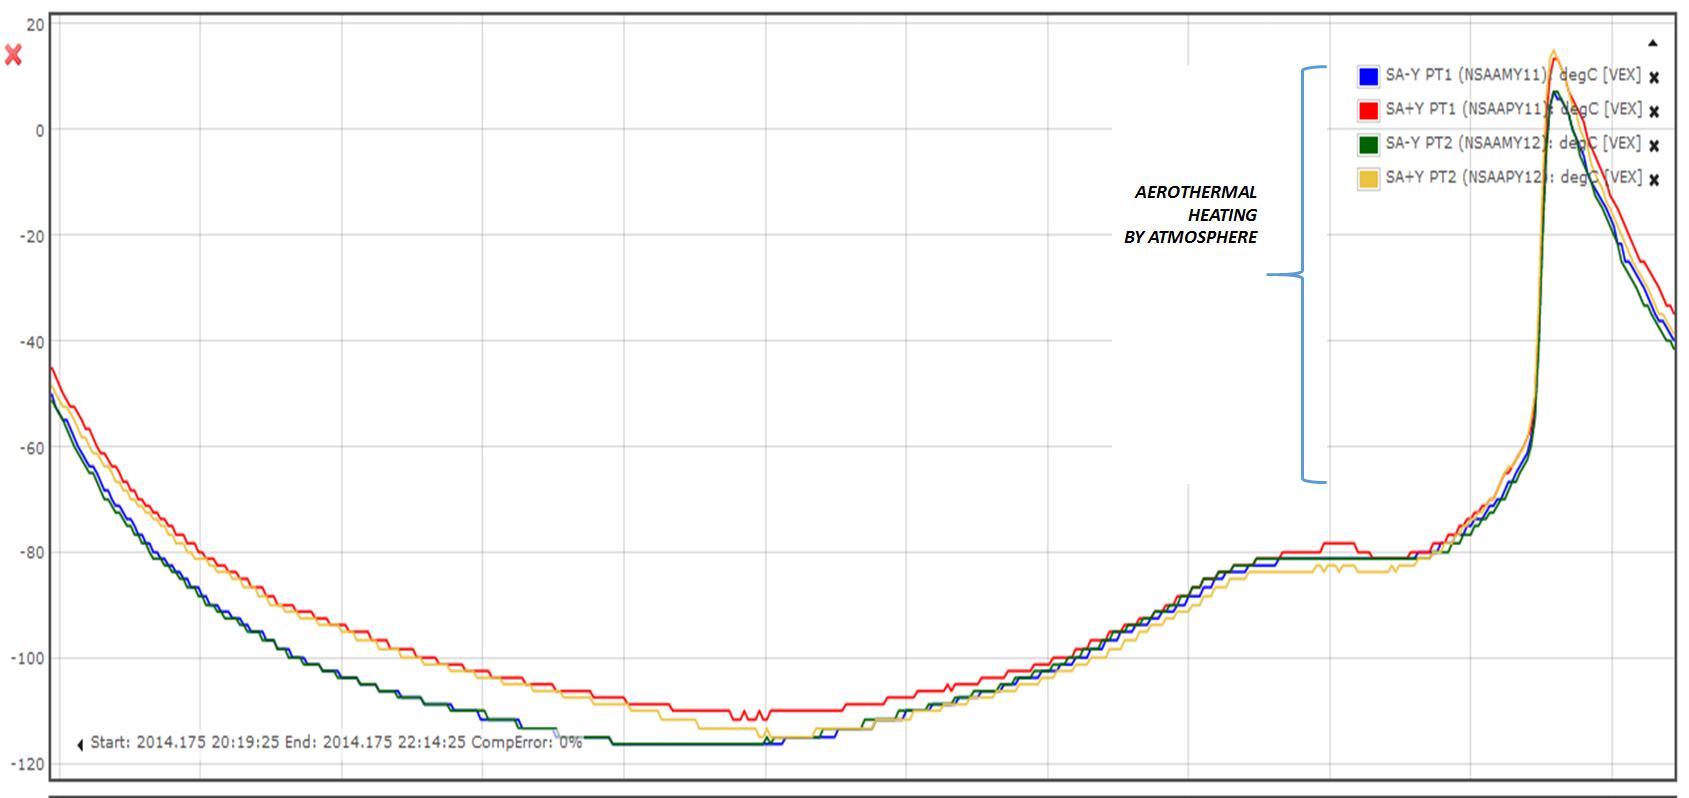 Solar array temperature profile during VEX braking mode orbit on 24 ...